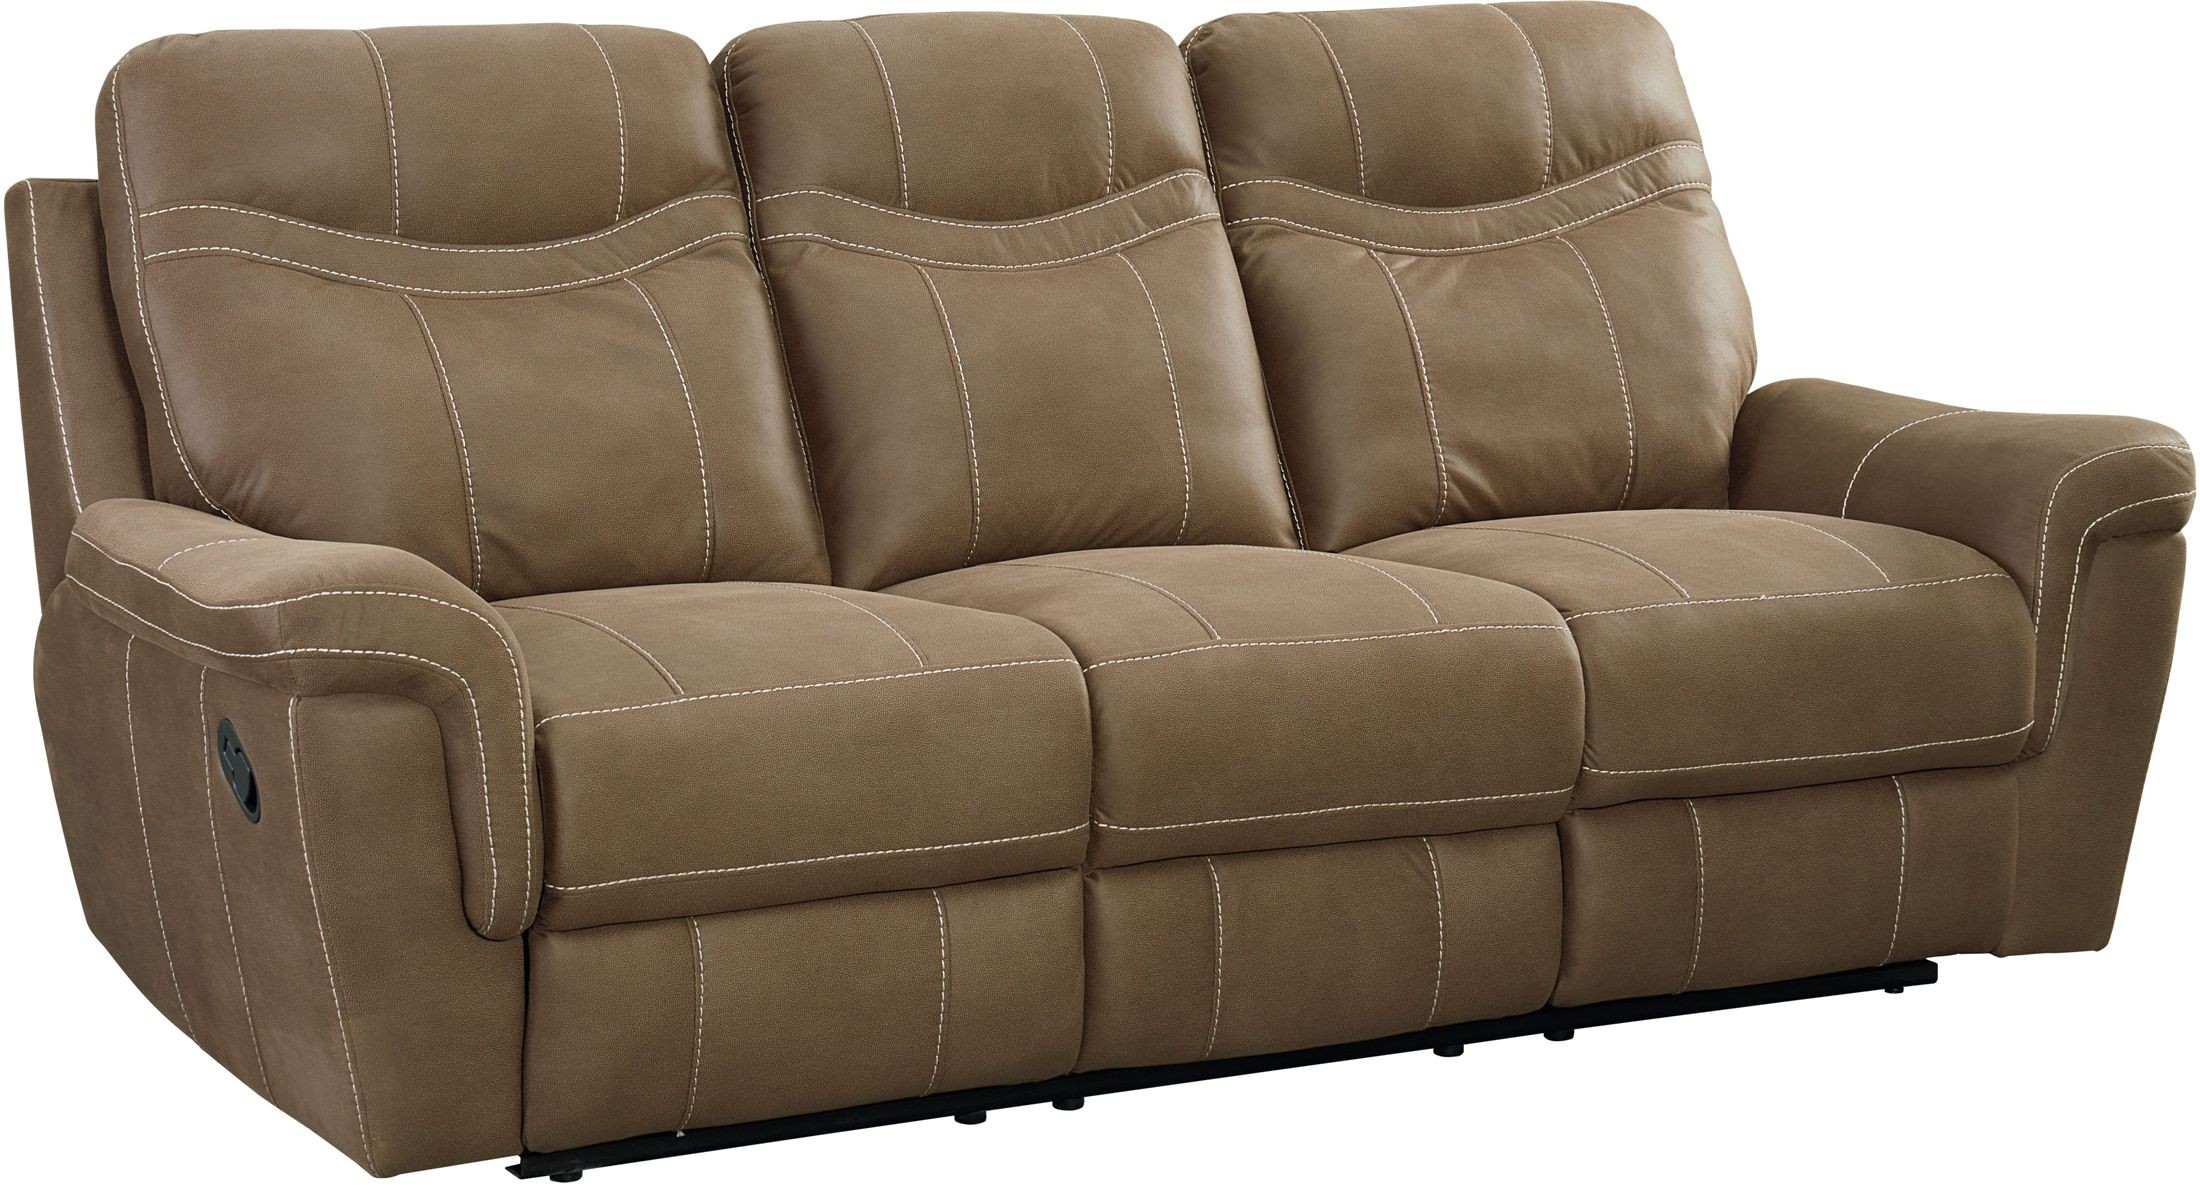 boardwalk sofa review wooden set latest design brown reclining from standard furniture